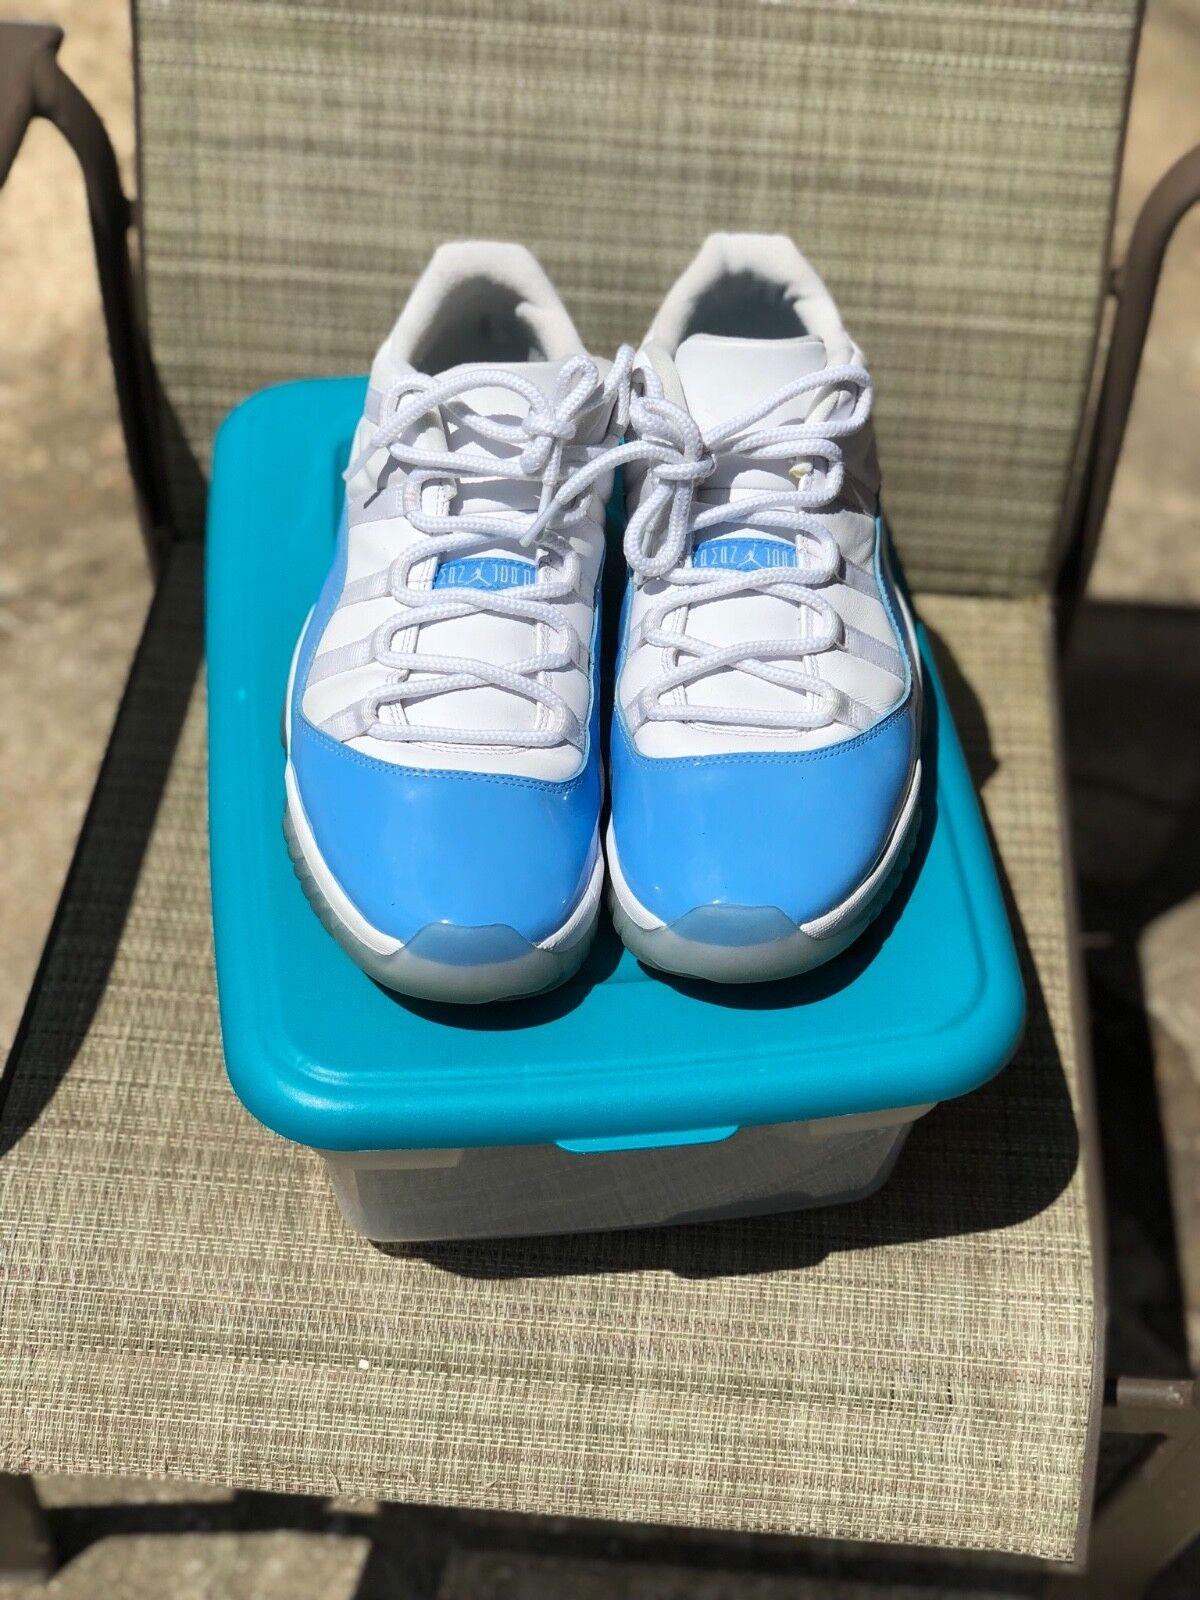 nike air jordan 11 retro low carolina size 12.5 The most popular shoes for men and women